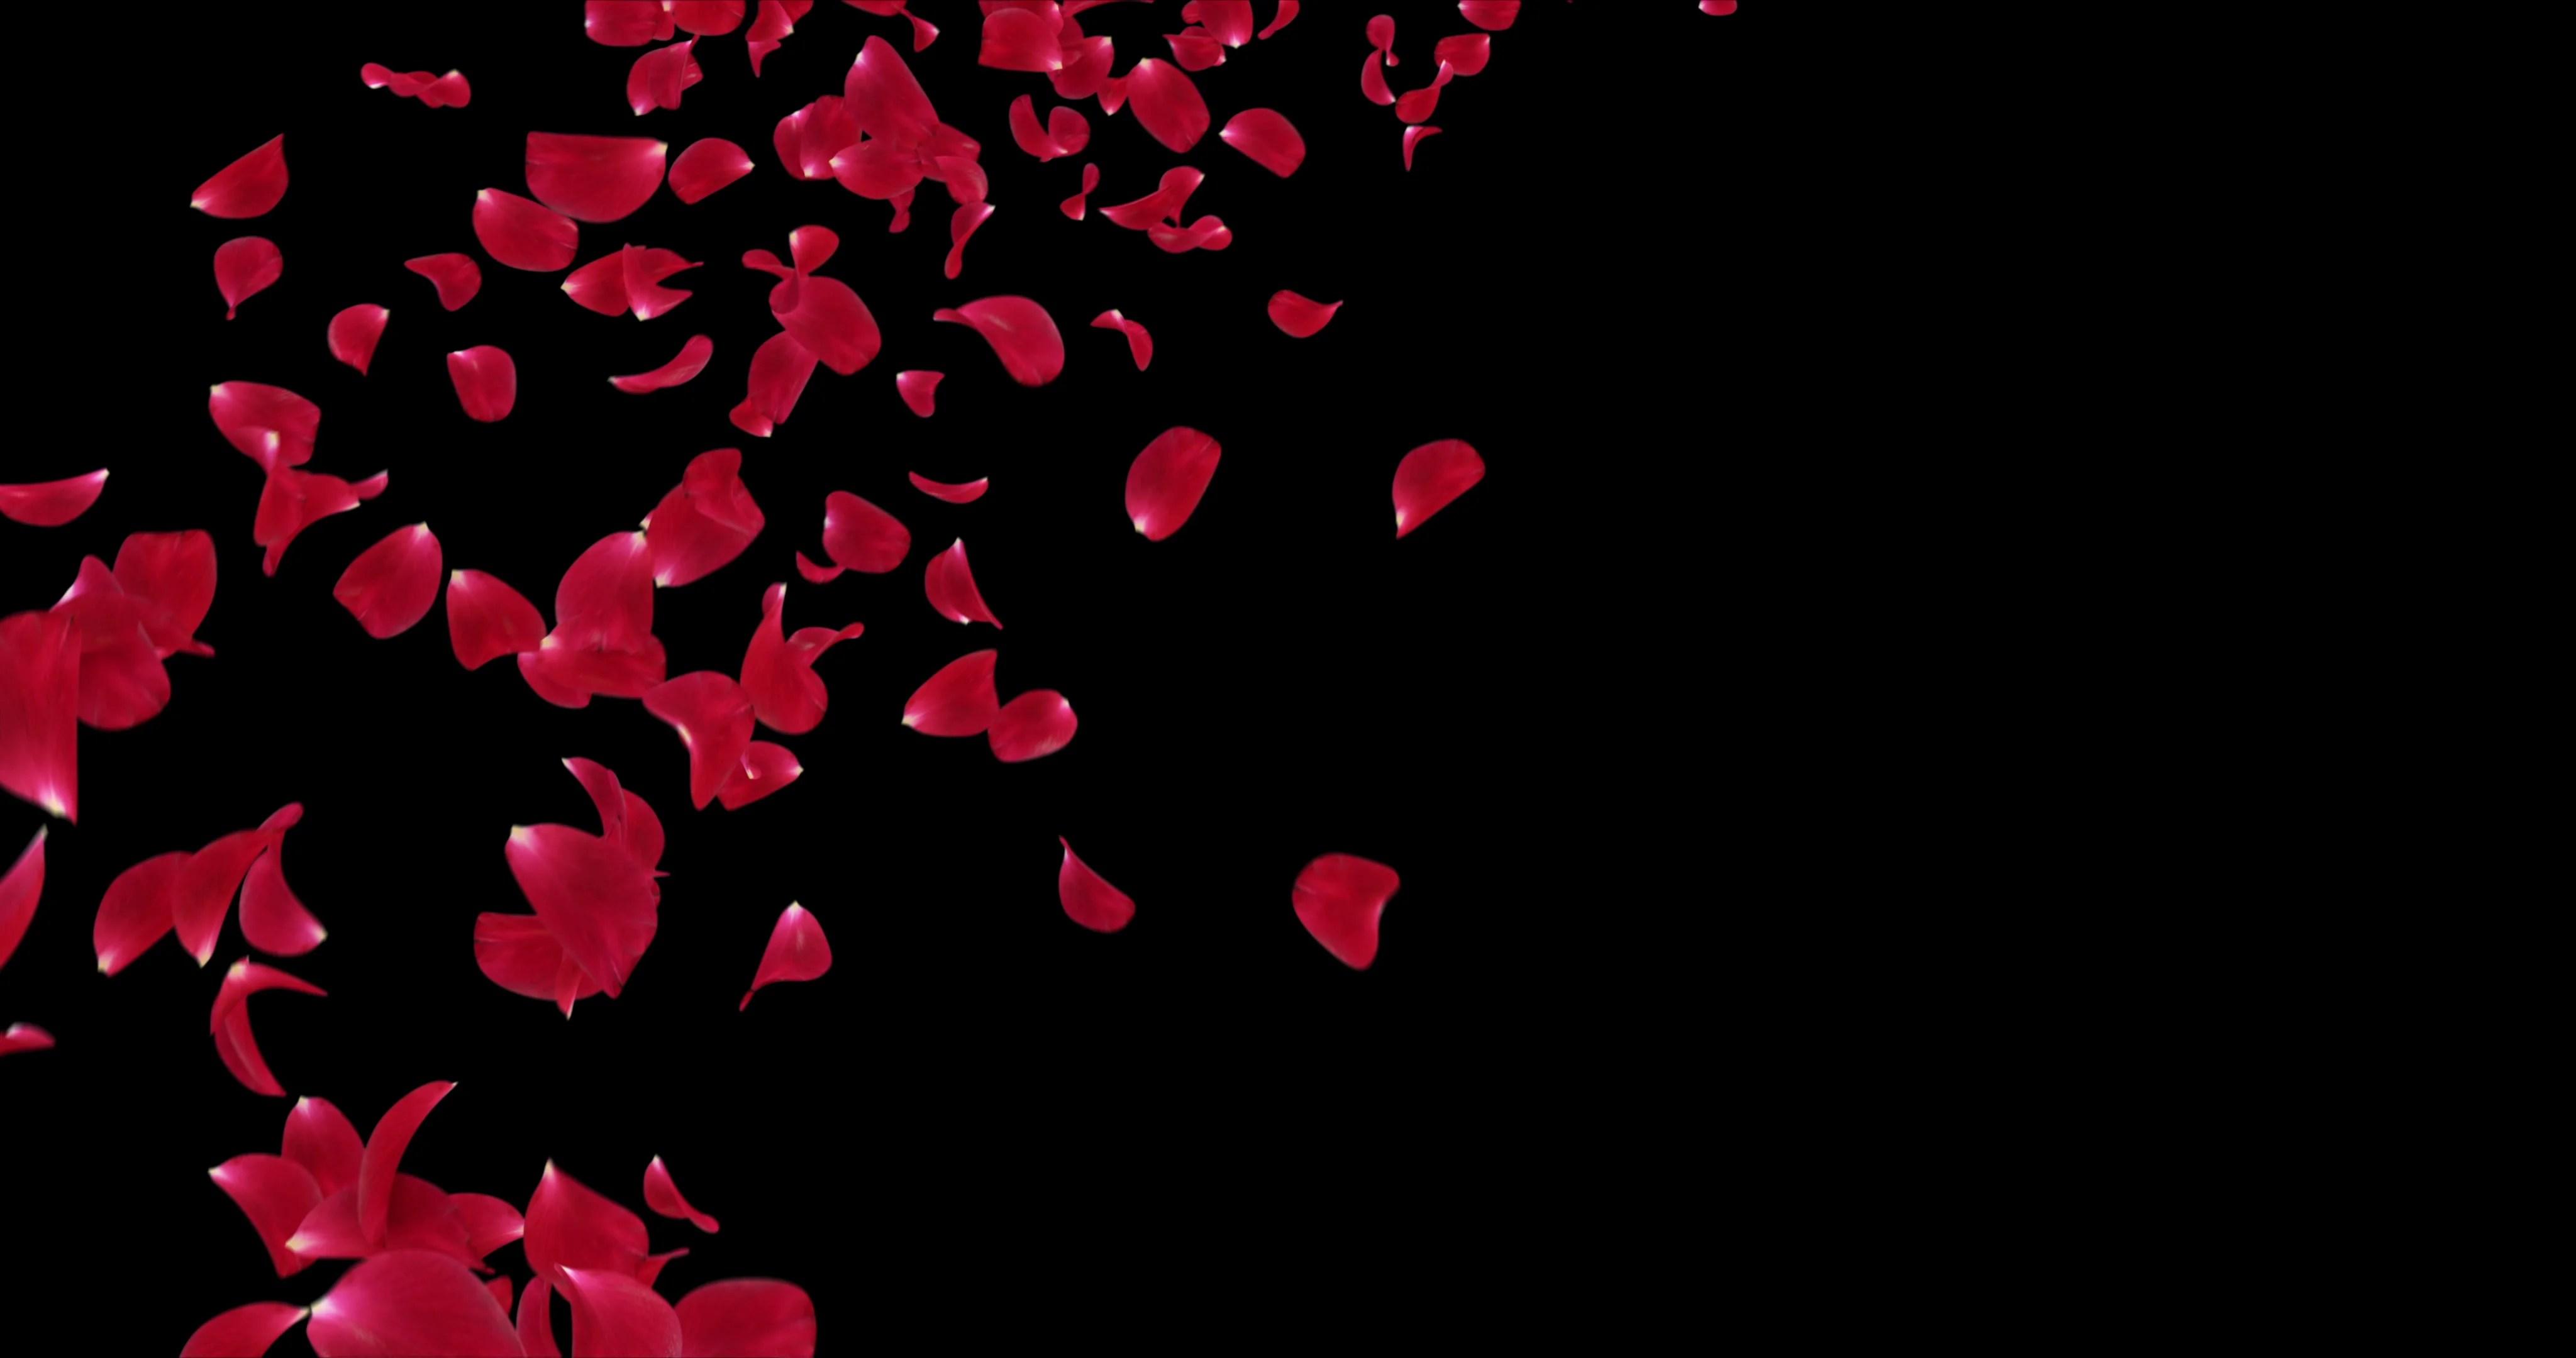 Rose Petals Falling Wallpaper Transparent Gif Flying Romantic Red Rose Flower Petals Falling Placeholder